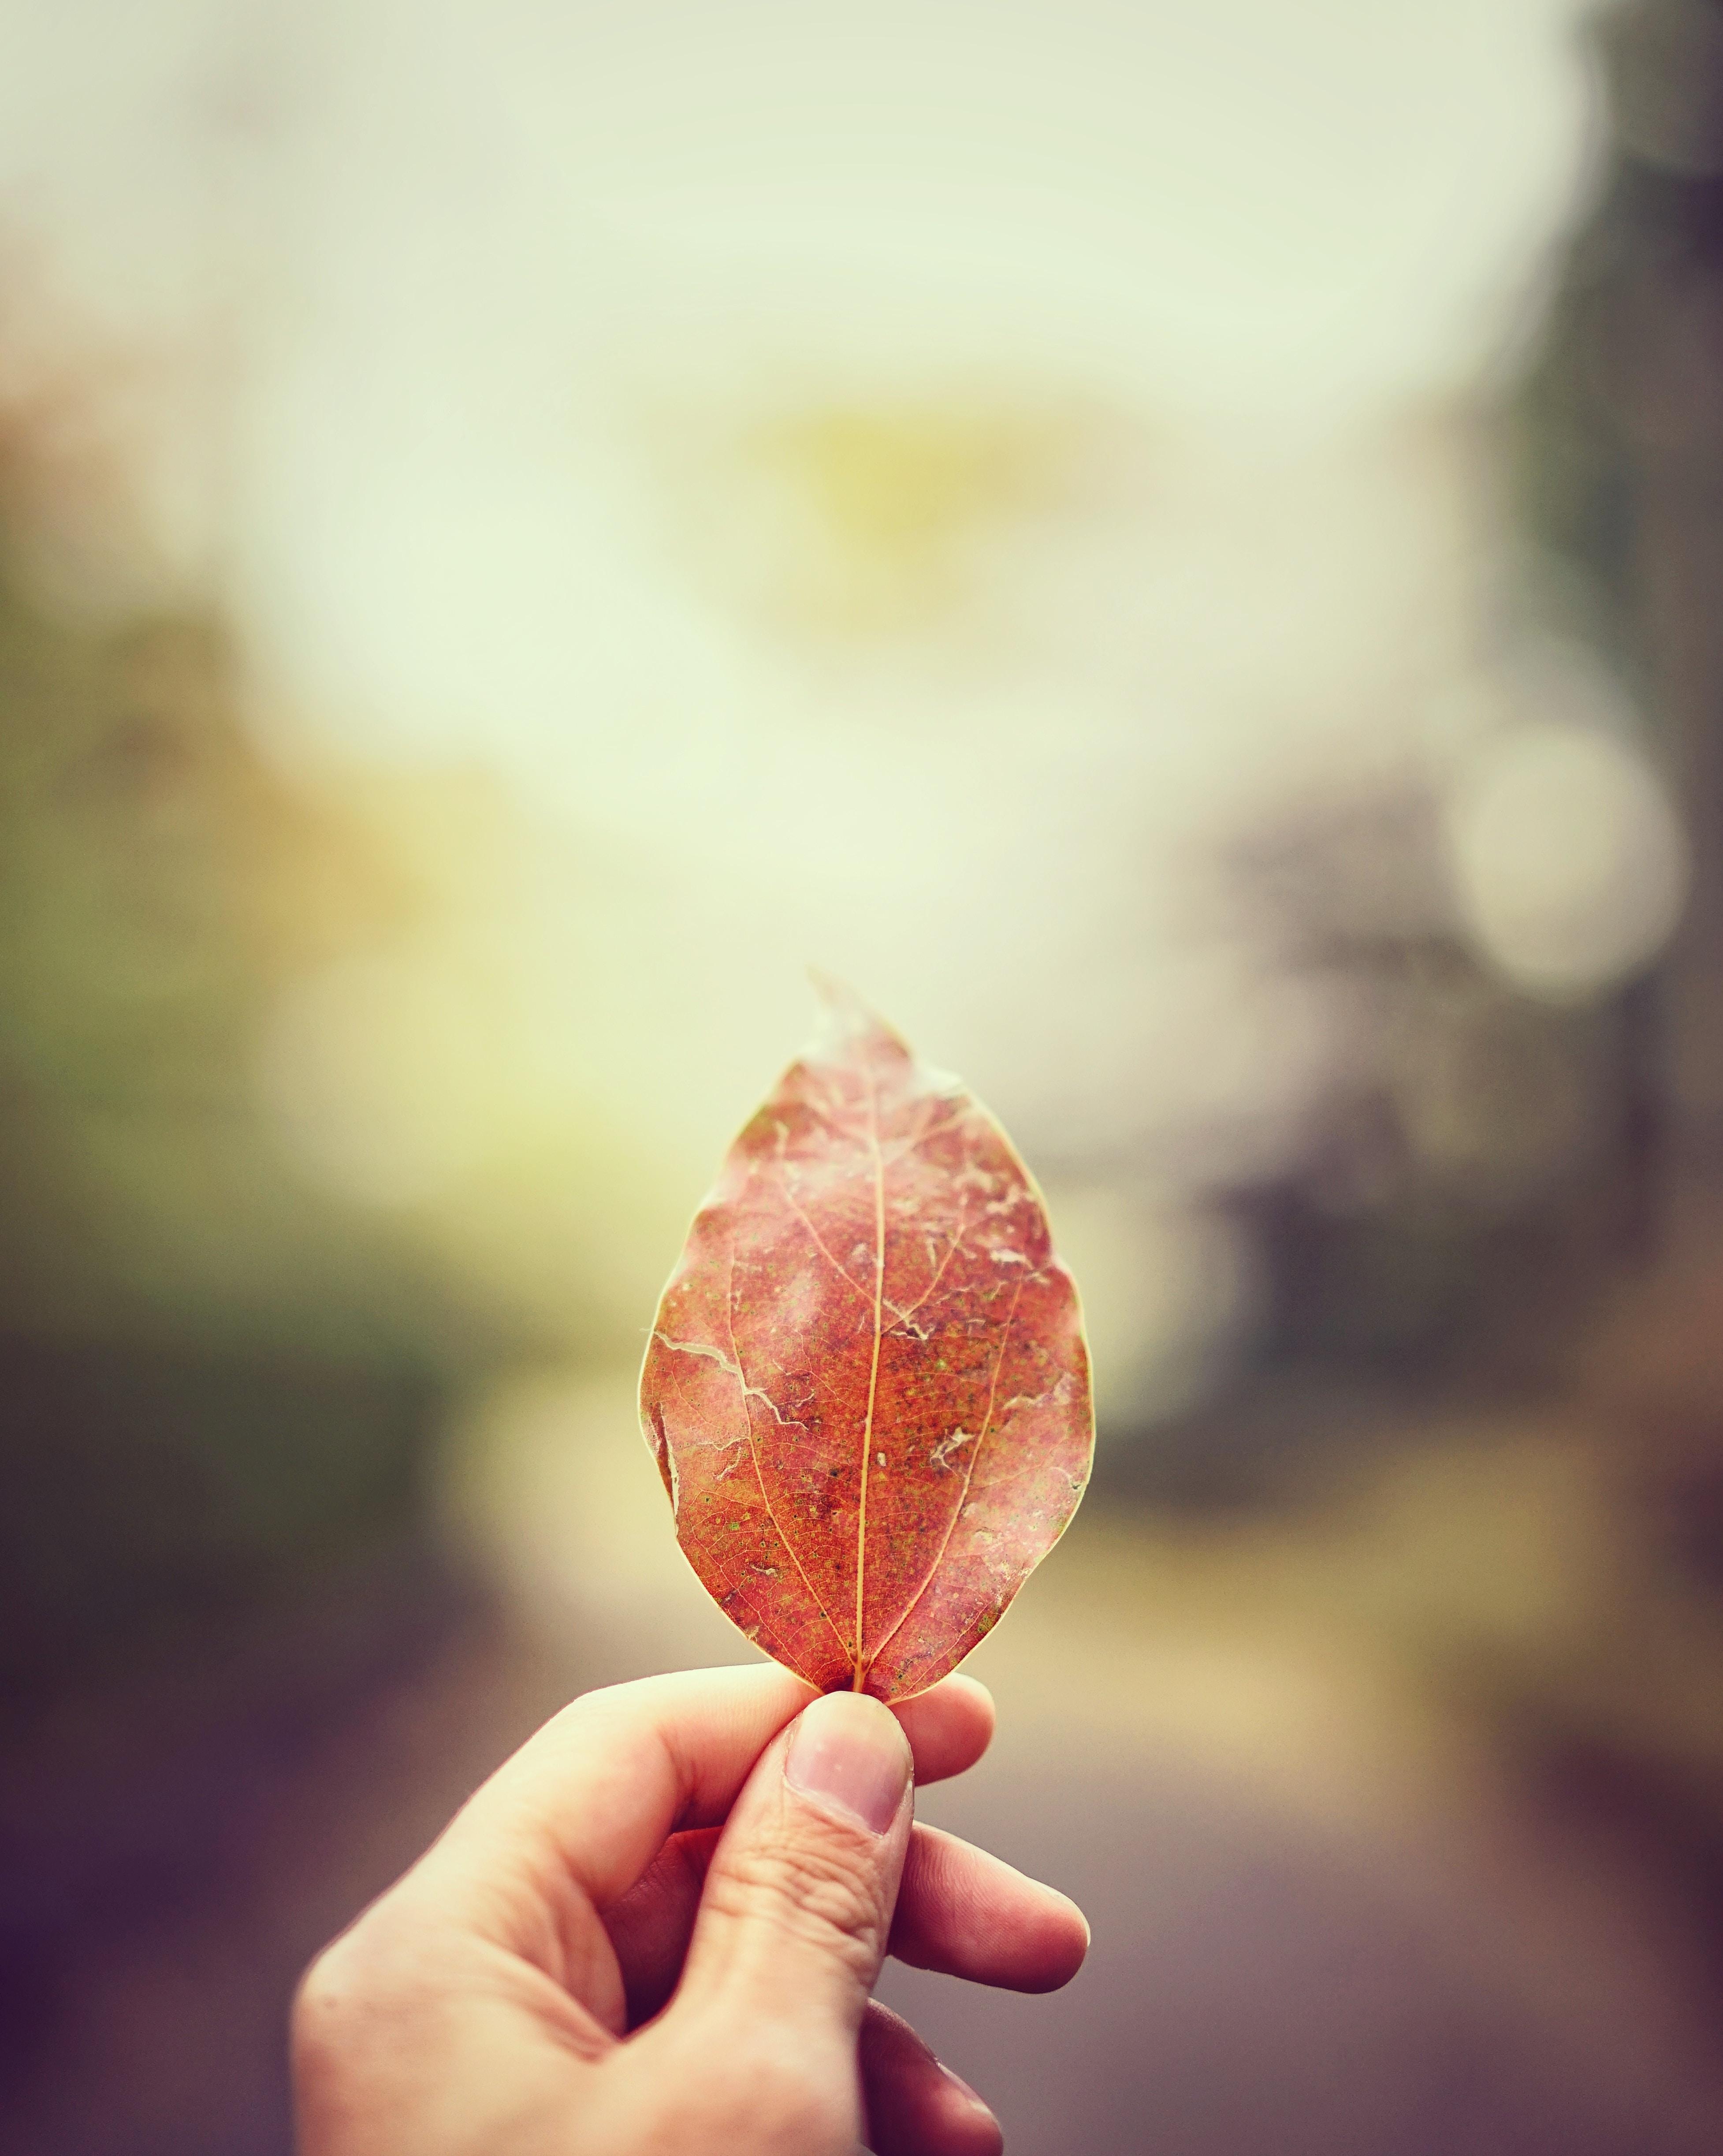 tilt shift lens photo of person holding dried leaf